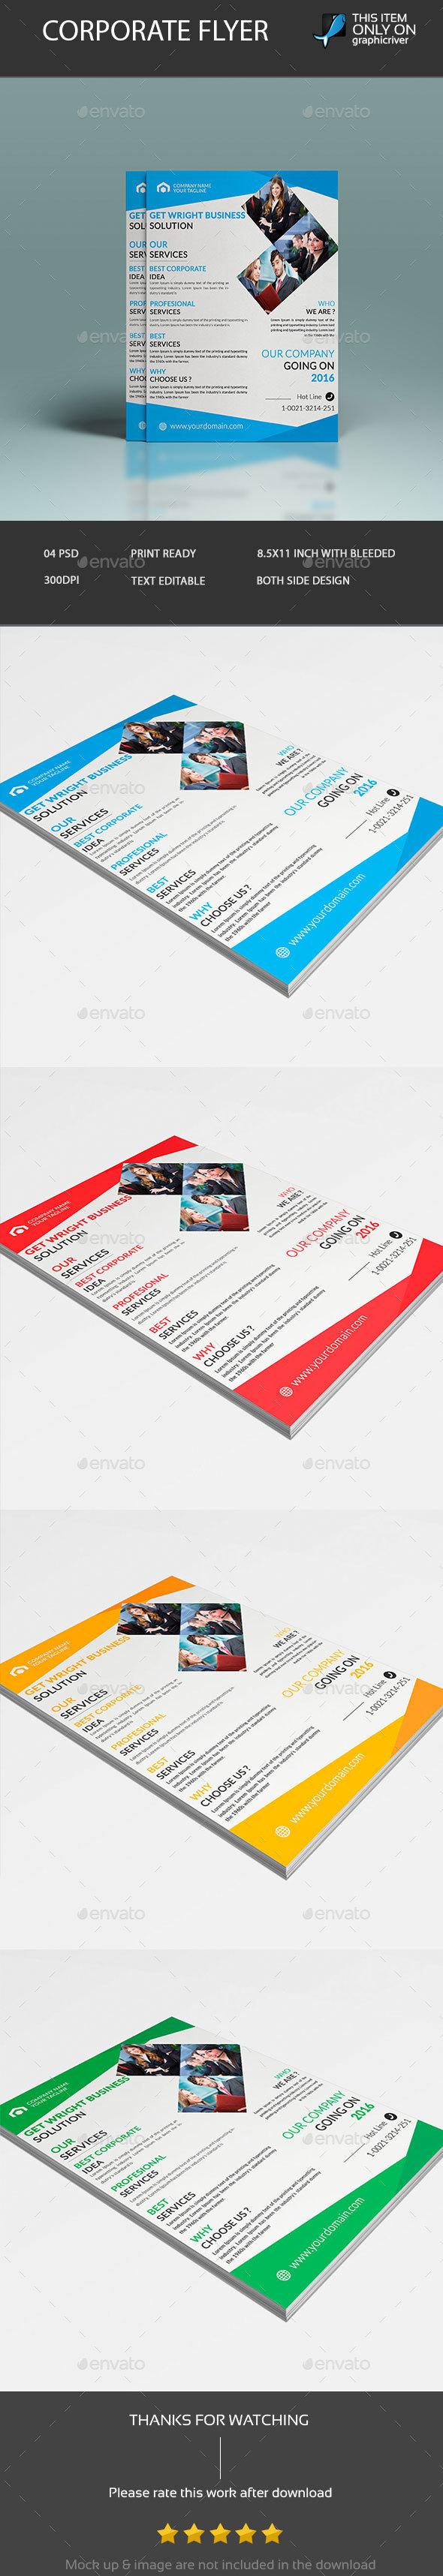 Corporate Flyer Design - Corporate Flyers